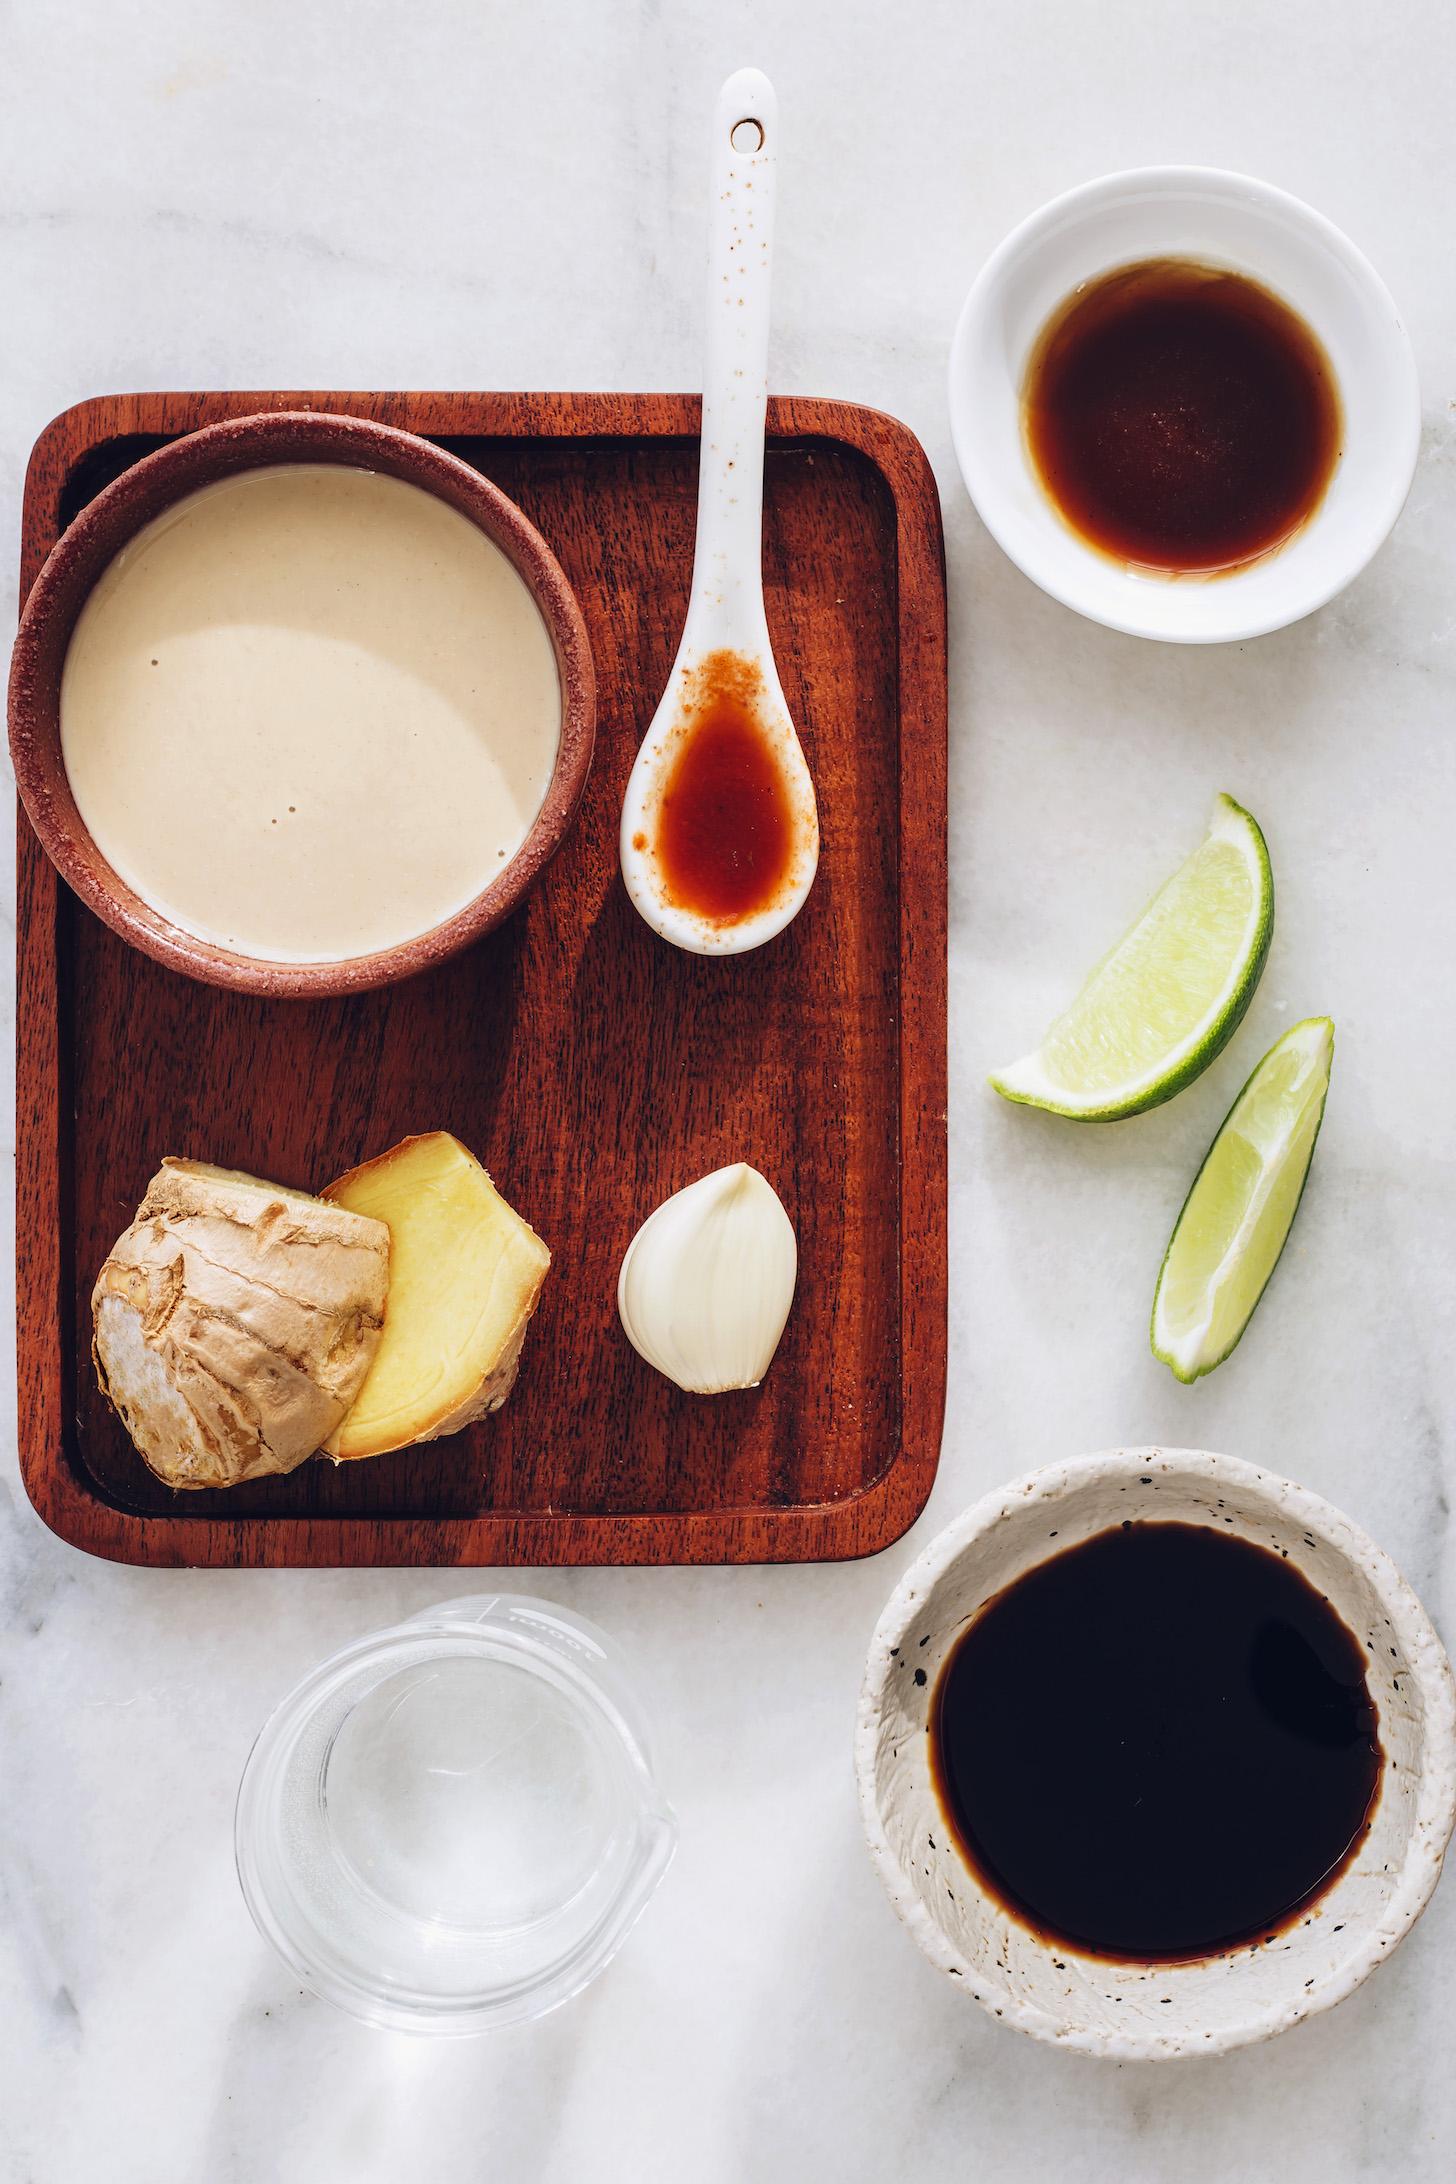 Tahini, gingembre, ail, sauce chili ail, citron vert, sirop d'érable, tamari et eau